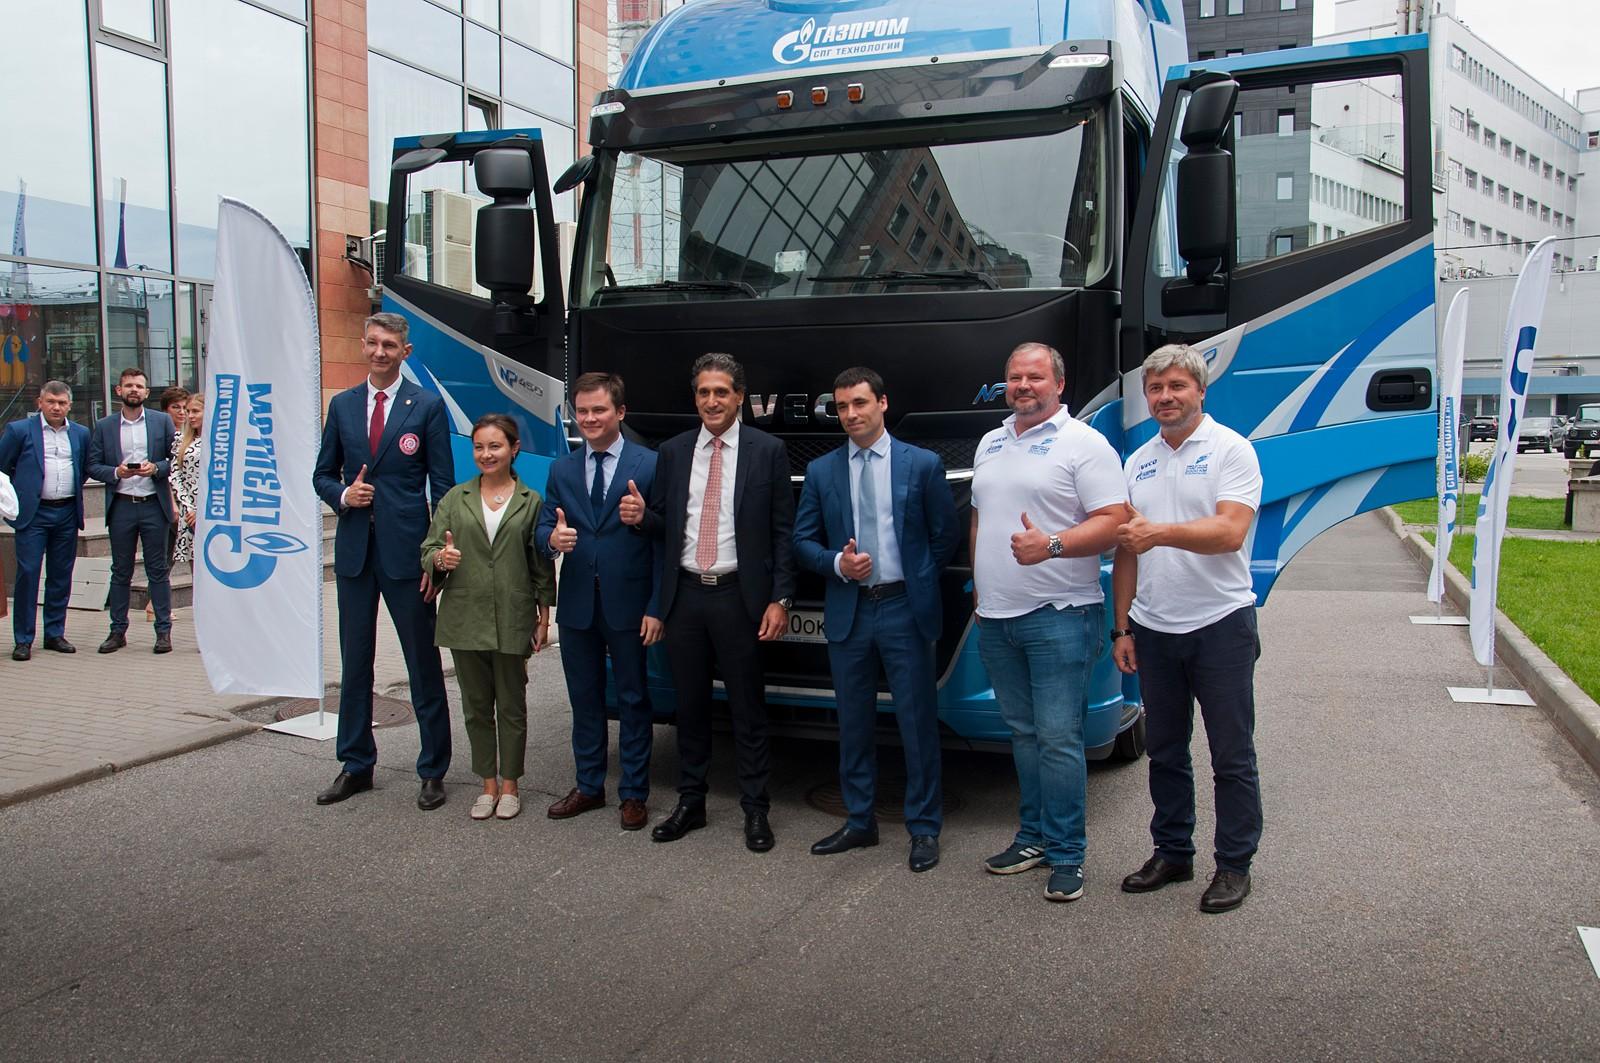 Идём на рекорд: ООО «Газпром СПГ технологии» и ООО «Ивеко Руссия» дали старт рекордному автопробегу на газе